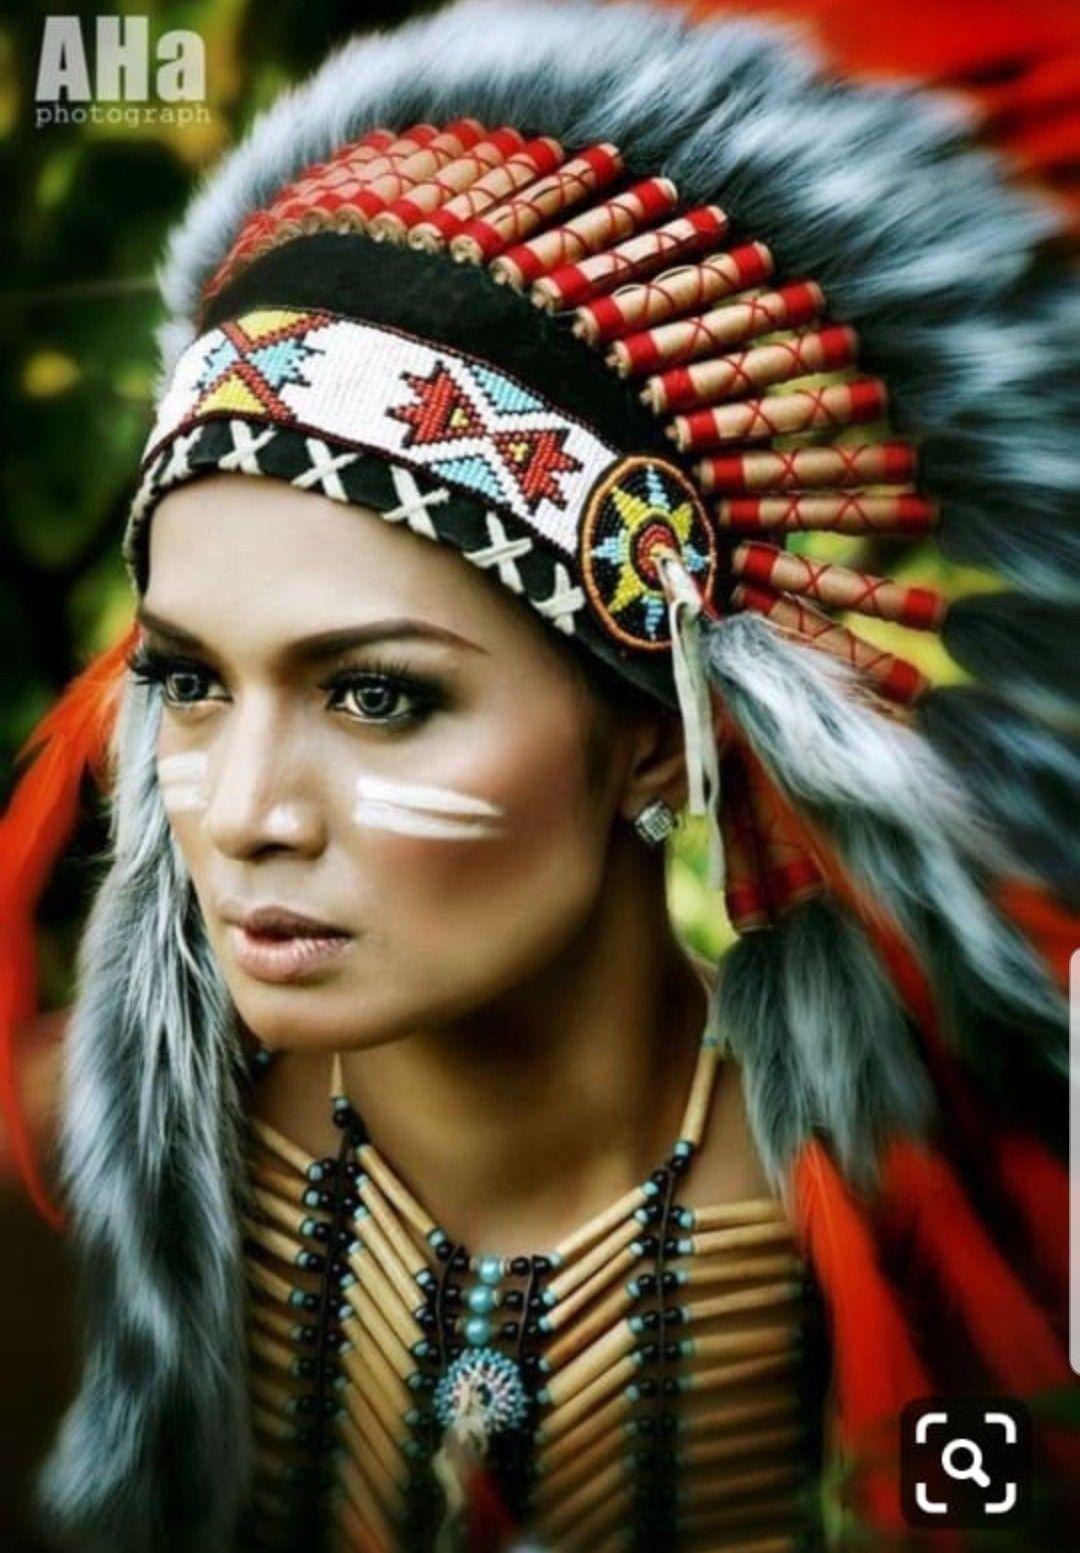 Pin de Sam Roberts em Indian girls em 2020 Indigenas